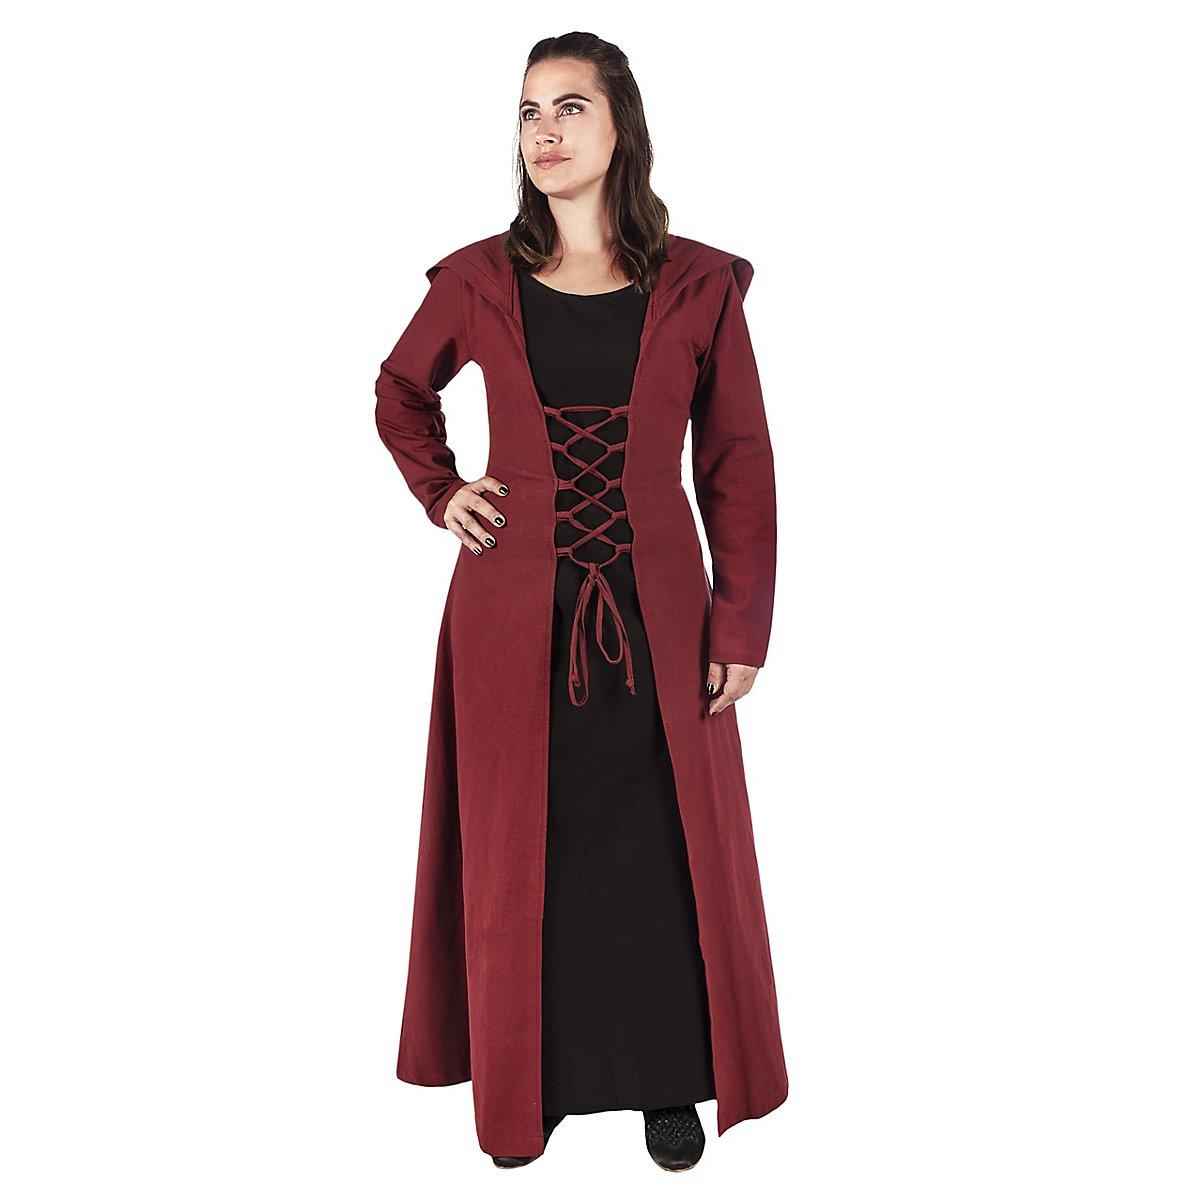 40607045bc255 Mittelalter Kleid mit Kapuze - Hestia - andracor.com